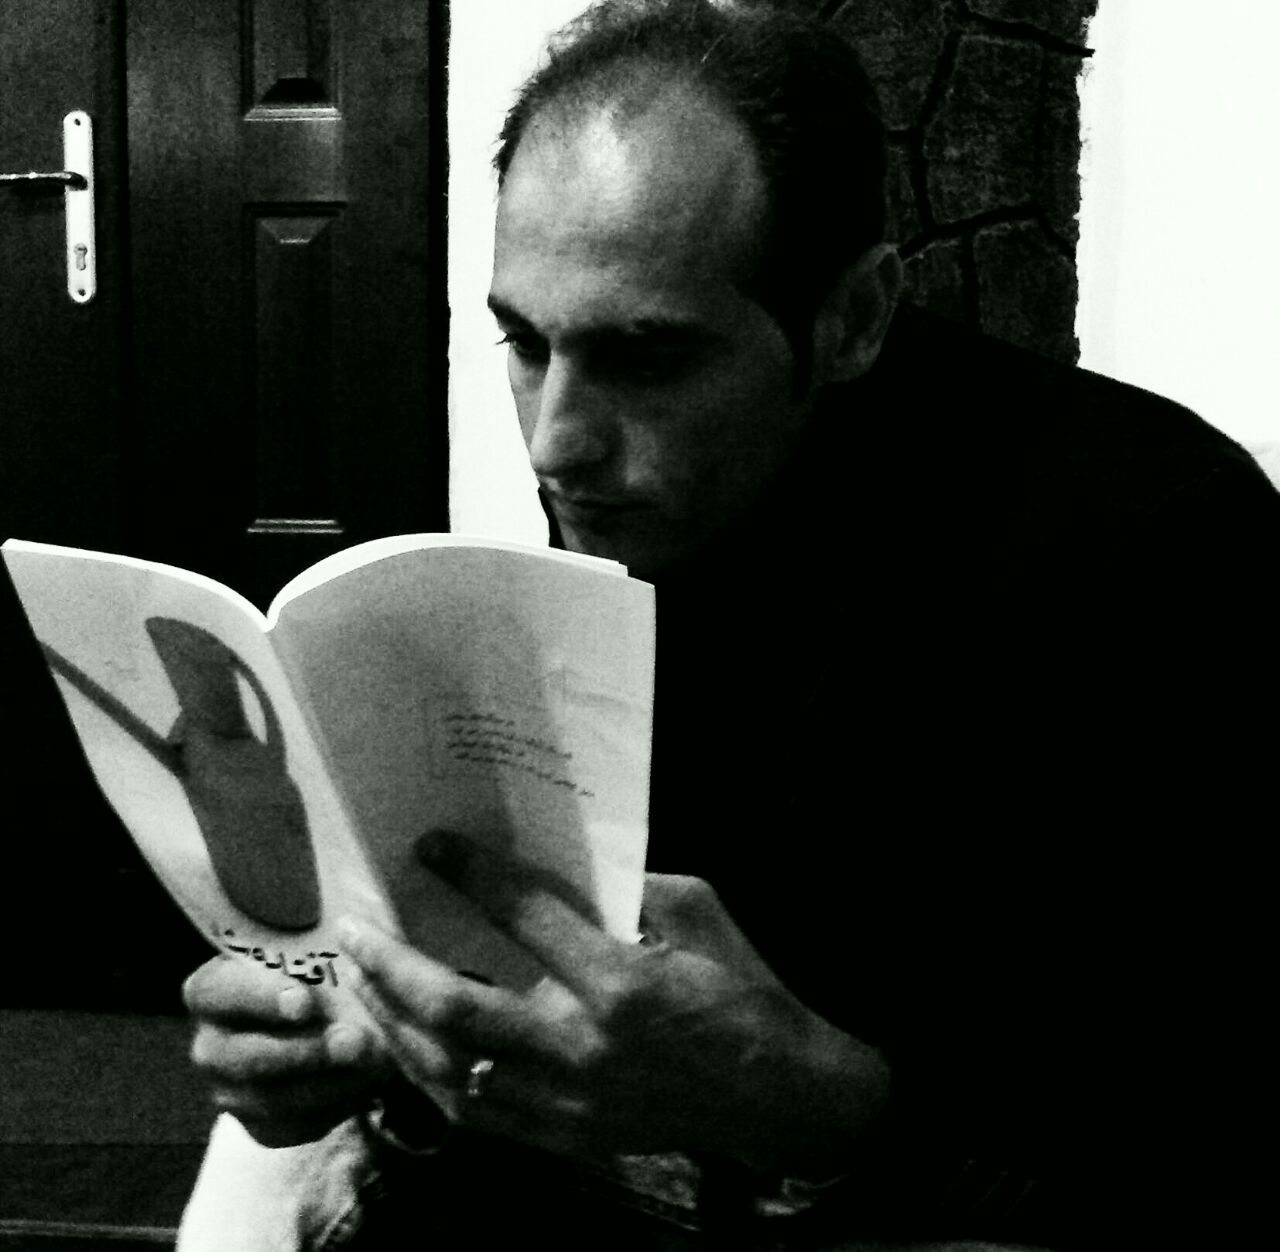 چند شعر از محمدرضا طاهرنسب